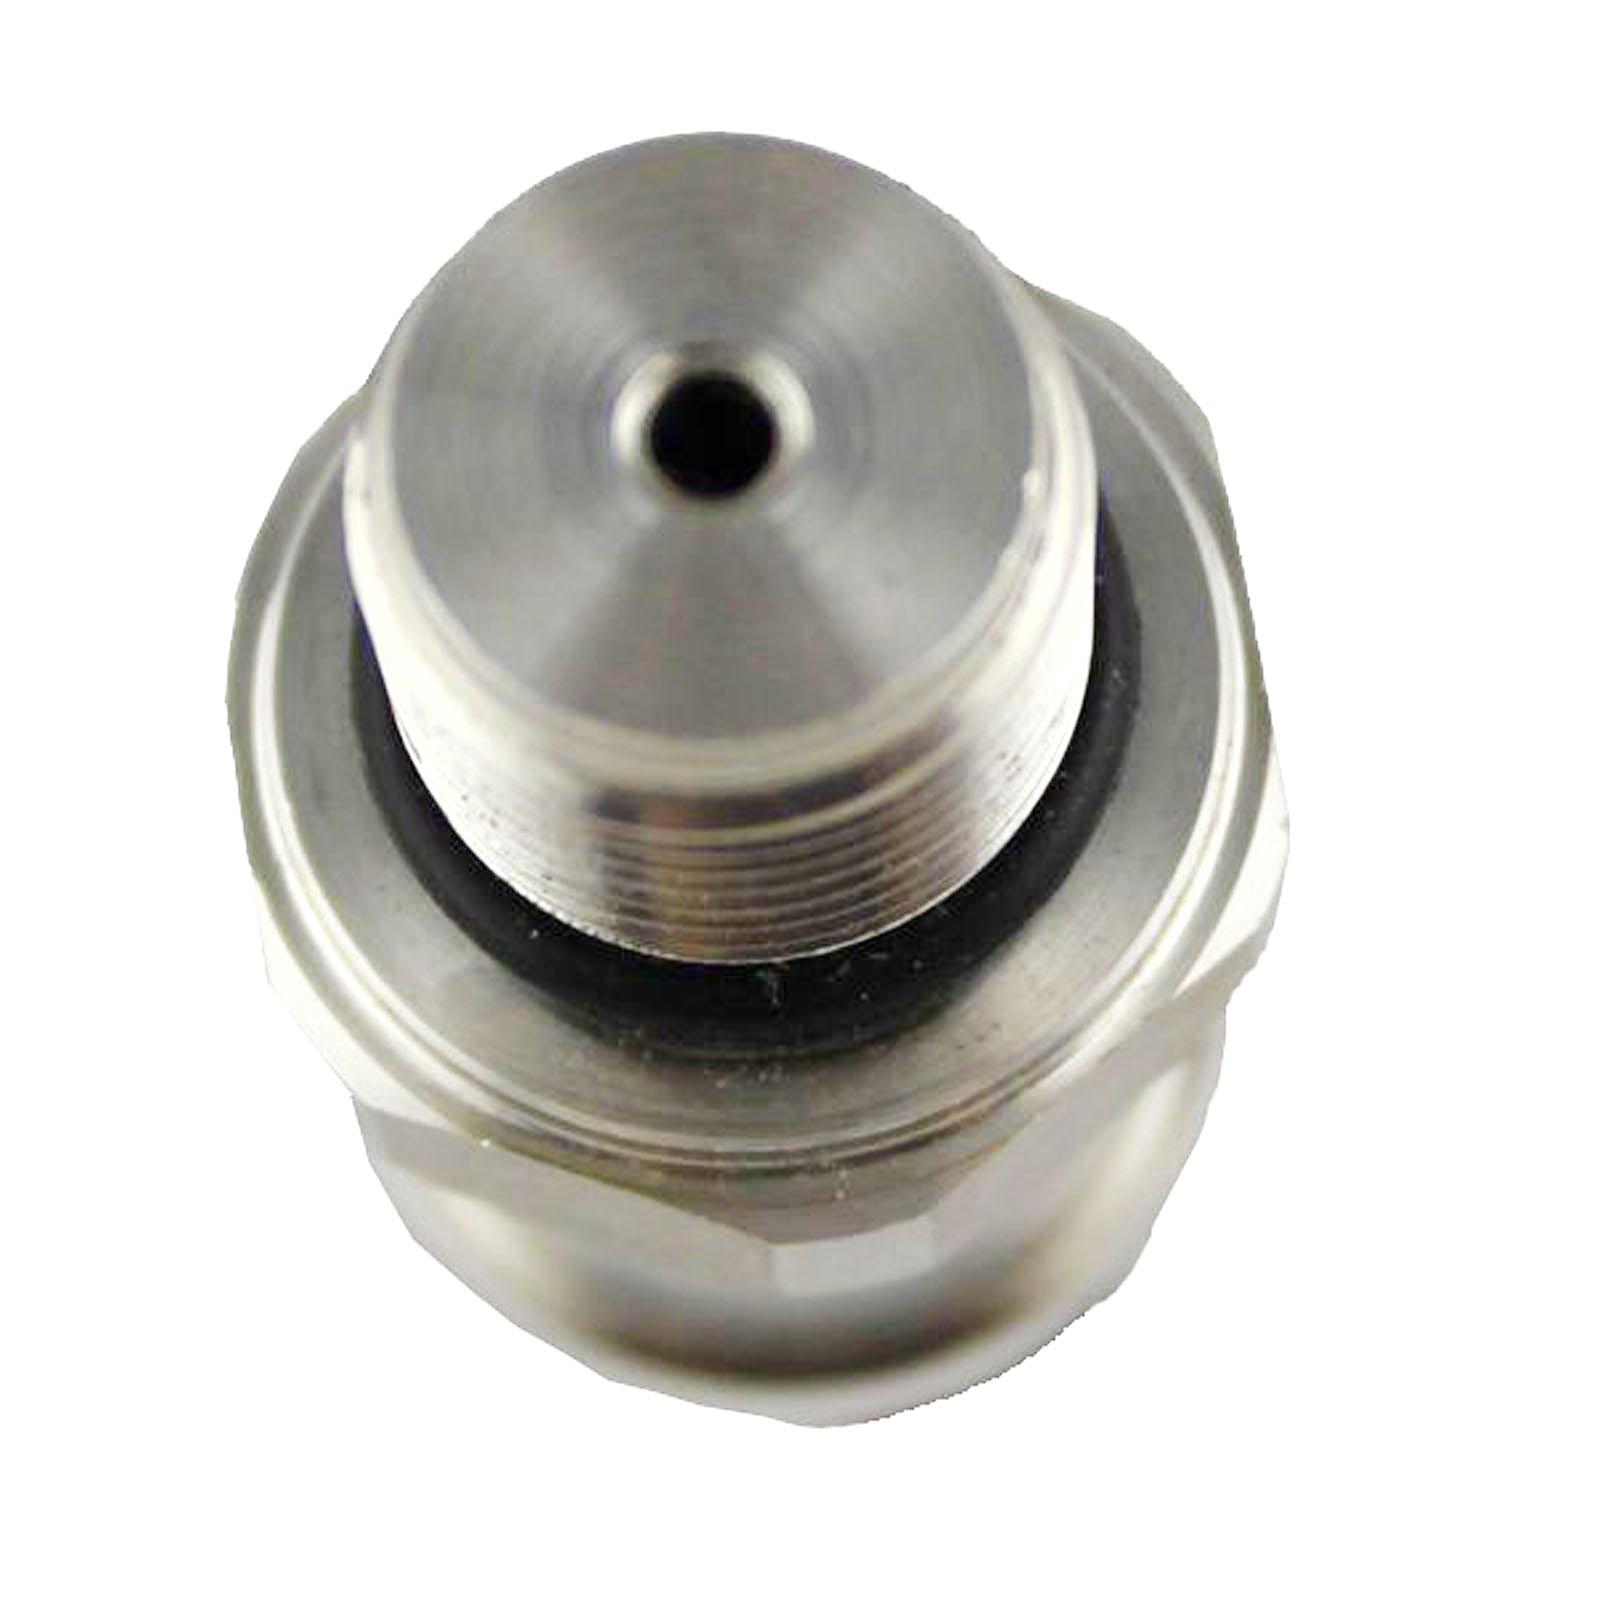 4339754 4248773 High Pressure Sensor 3 Month Warranty SINOCMP Pressure Sensor for Hitachi EX200LC-2 EX100-2 Pressure Switch